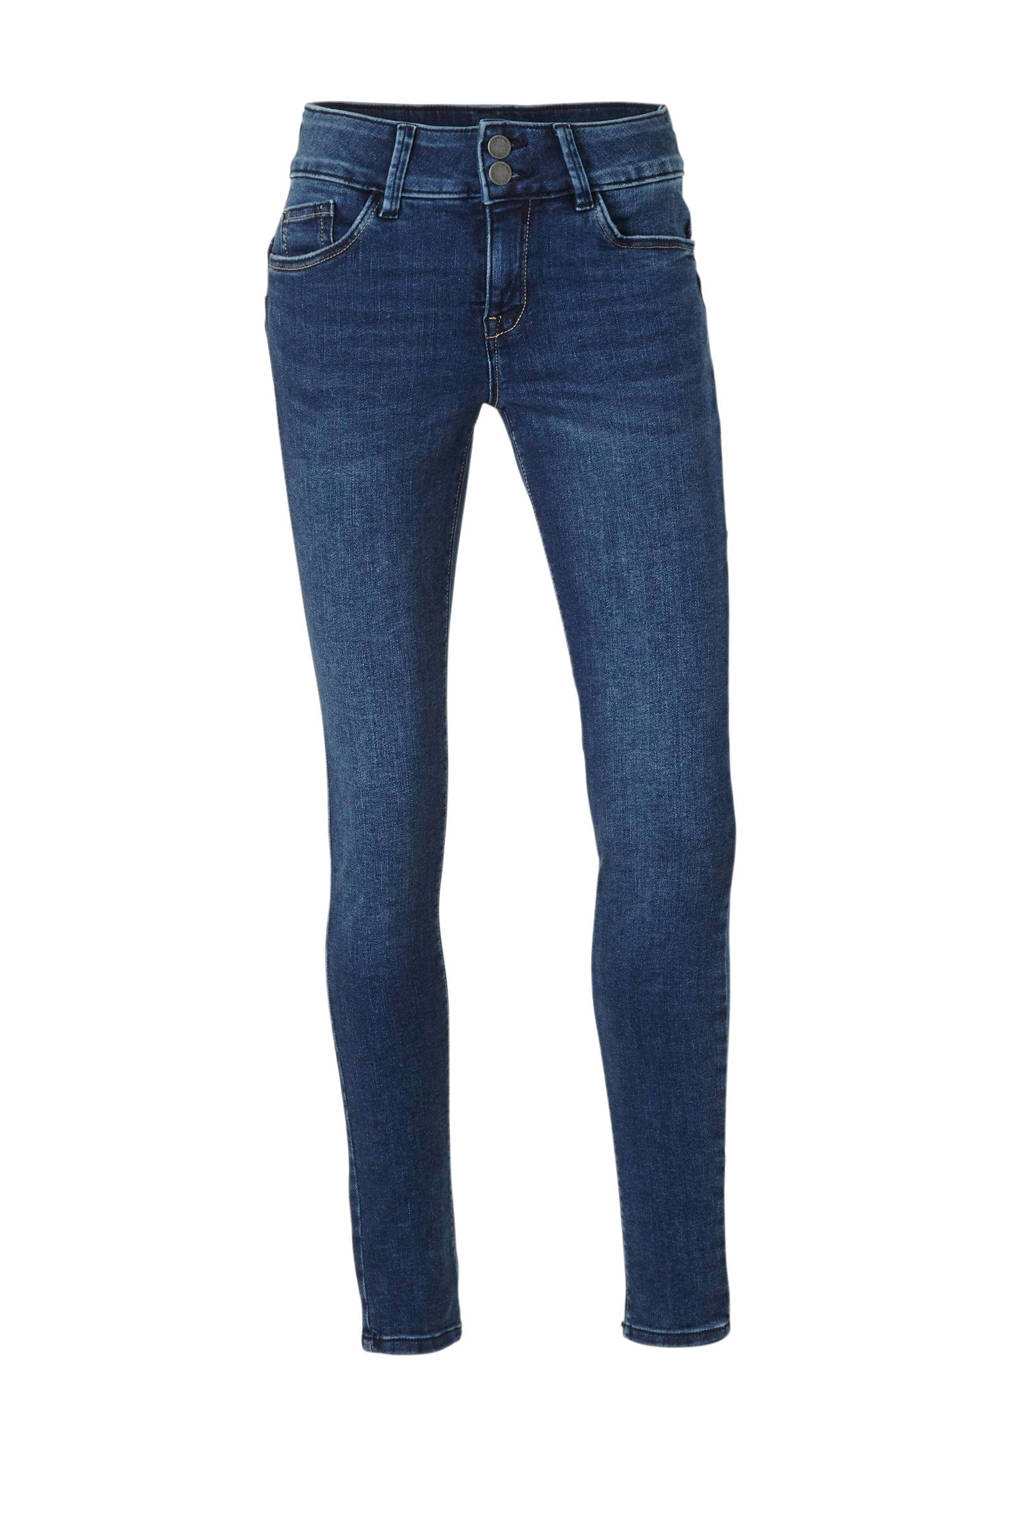 C&A The Denim high waist skinny jeans, Dark denim